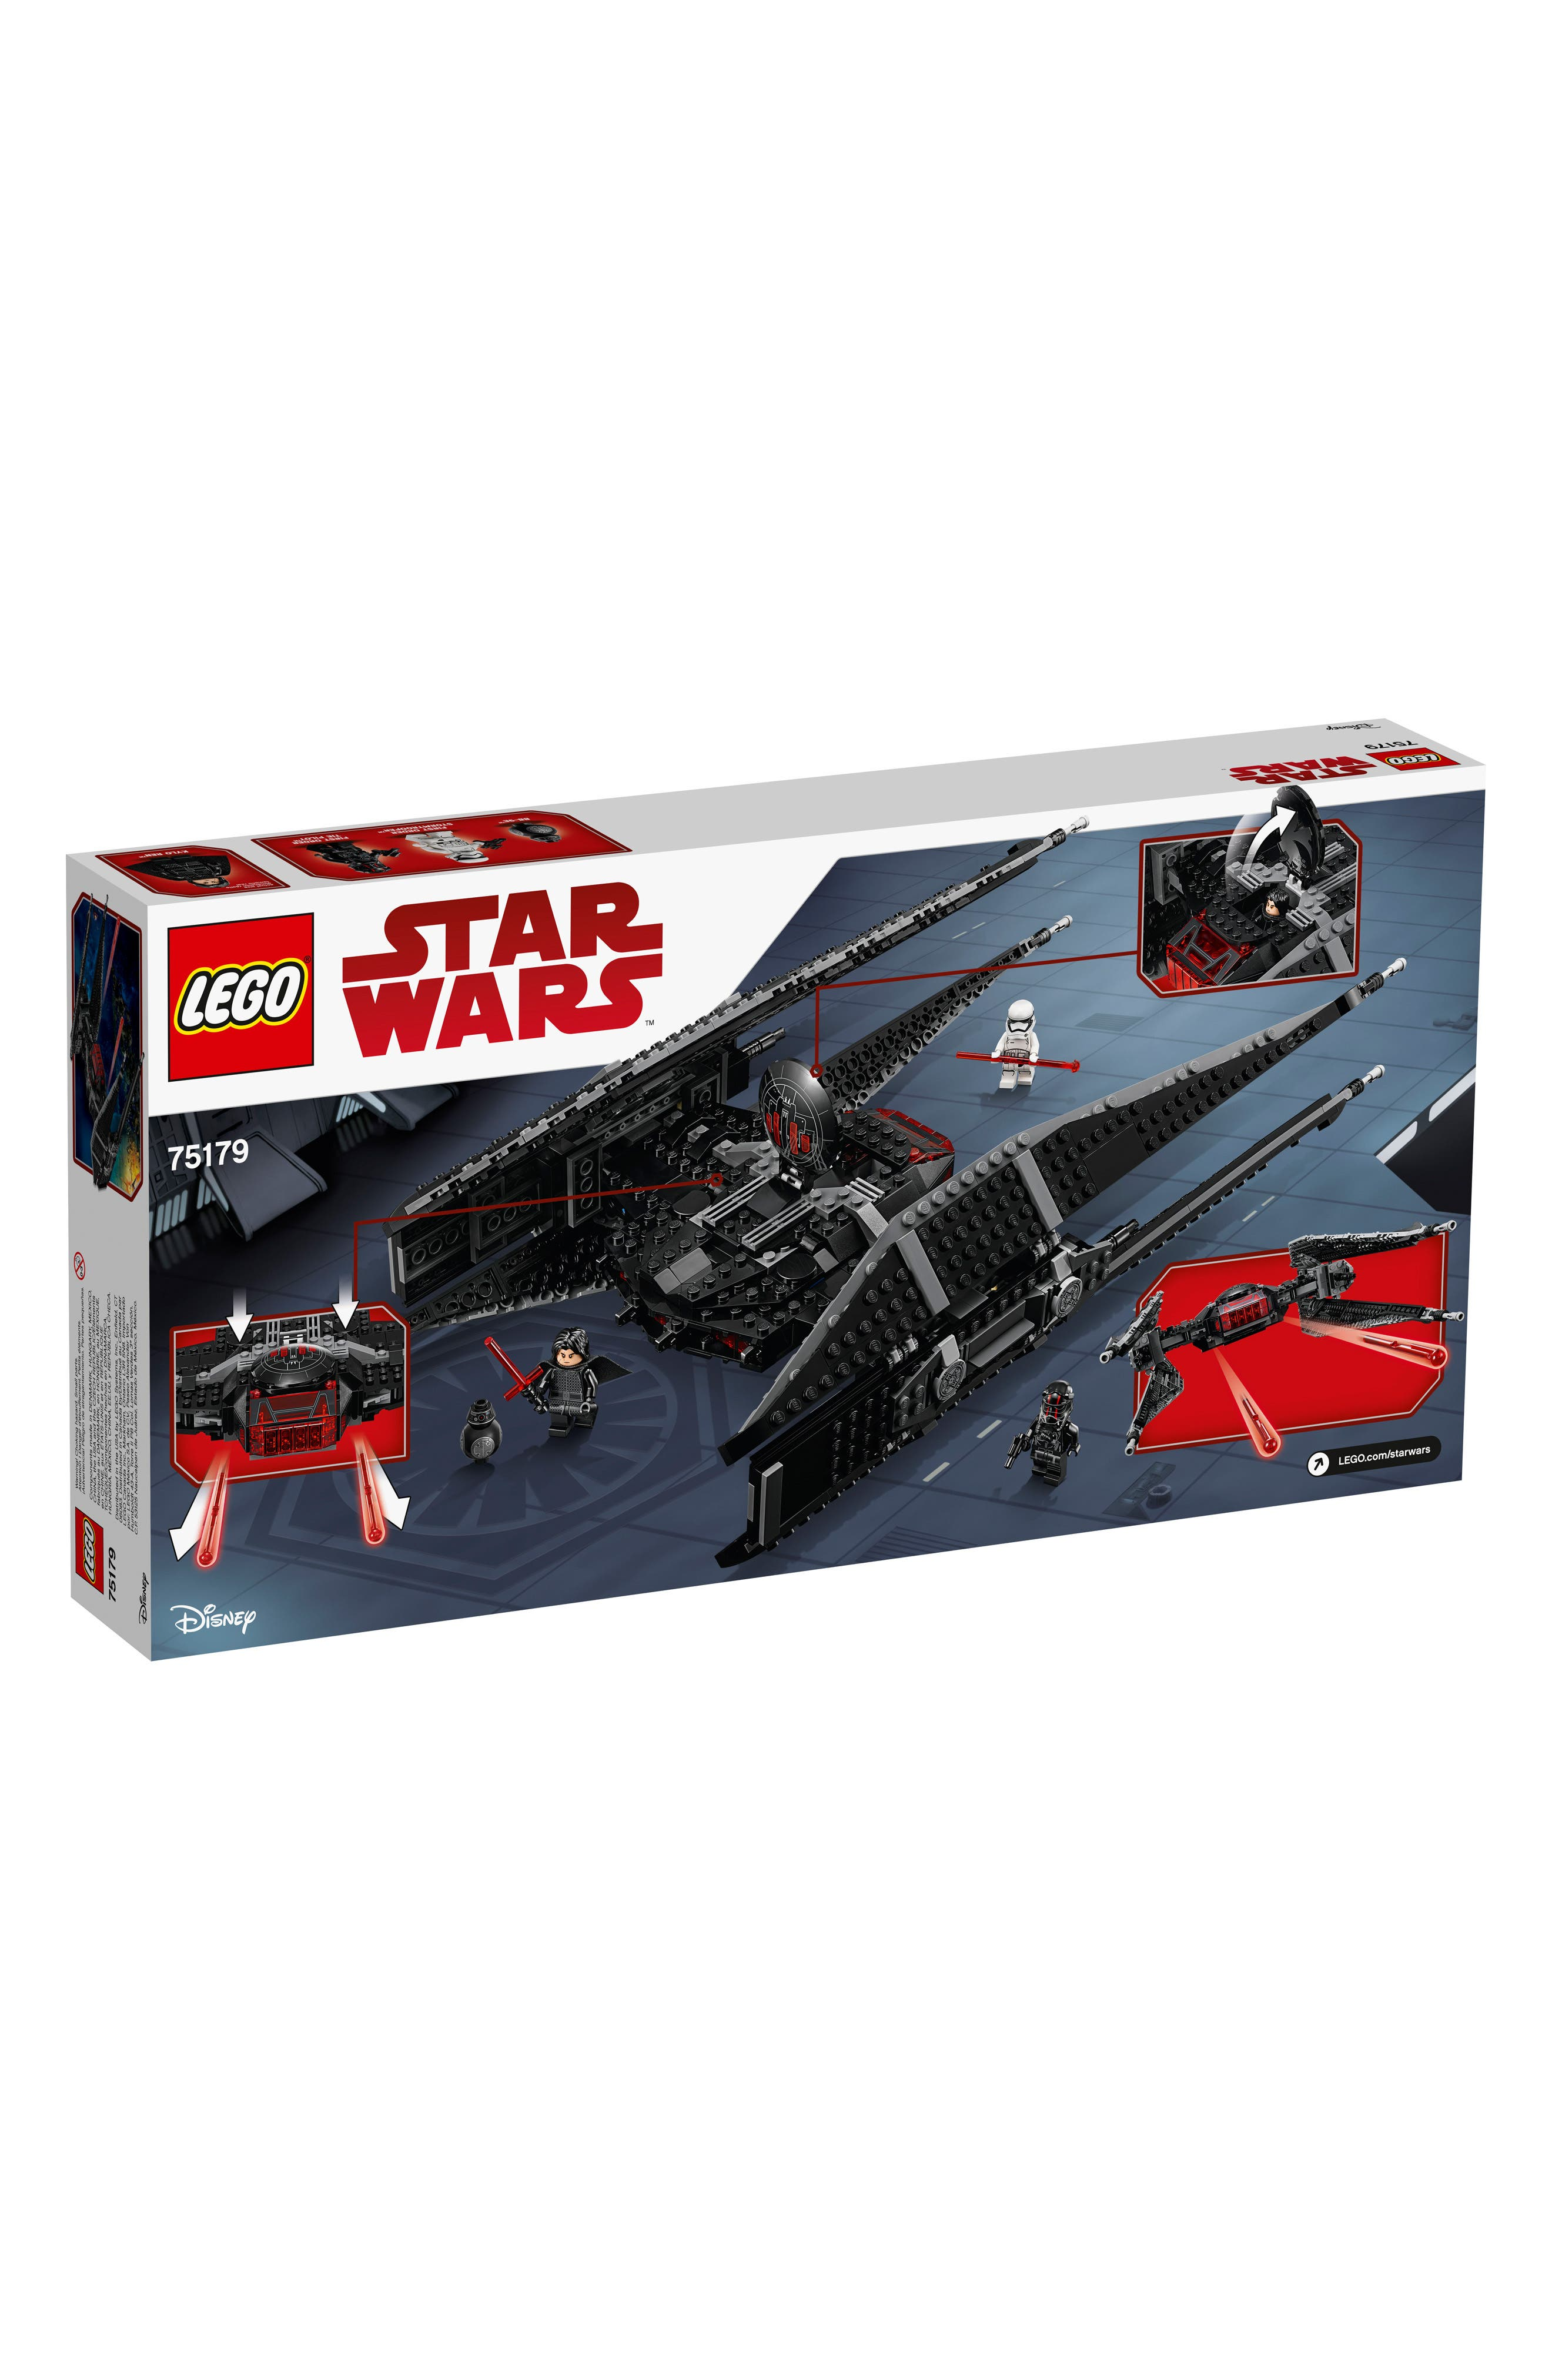 Star Wars<sup>™</sup> Kylo Ren's TIE Fighter - 75179,                         Main,                         color, Multi